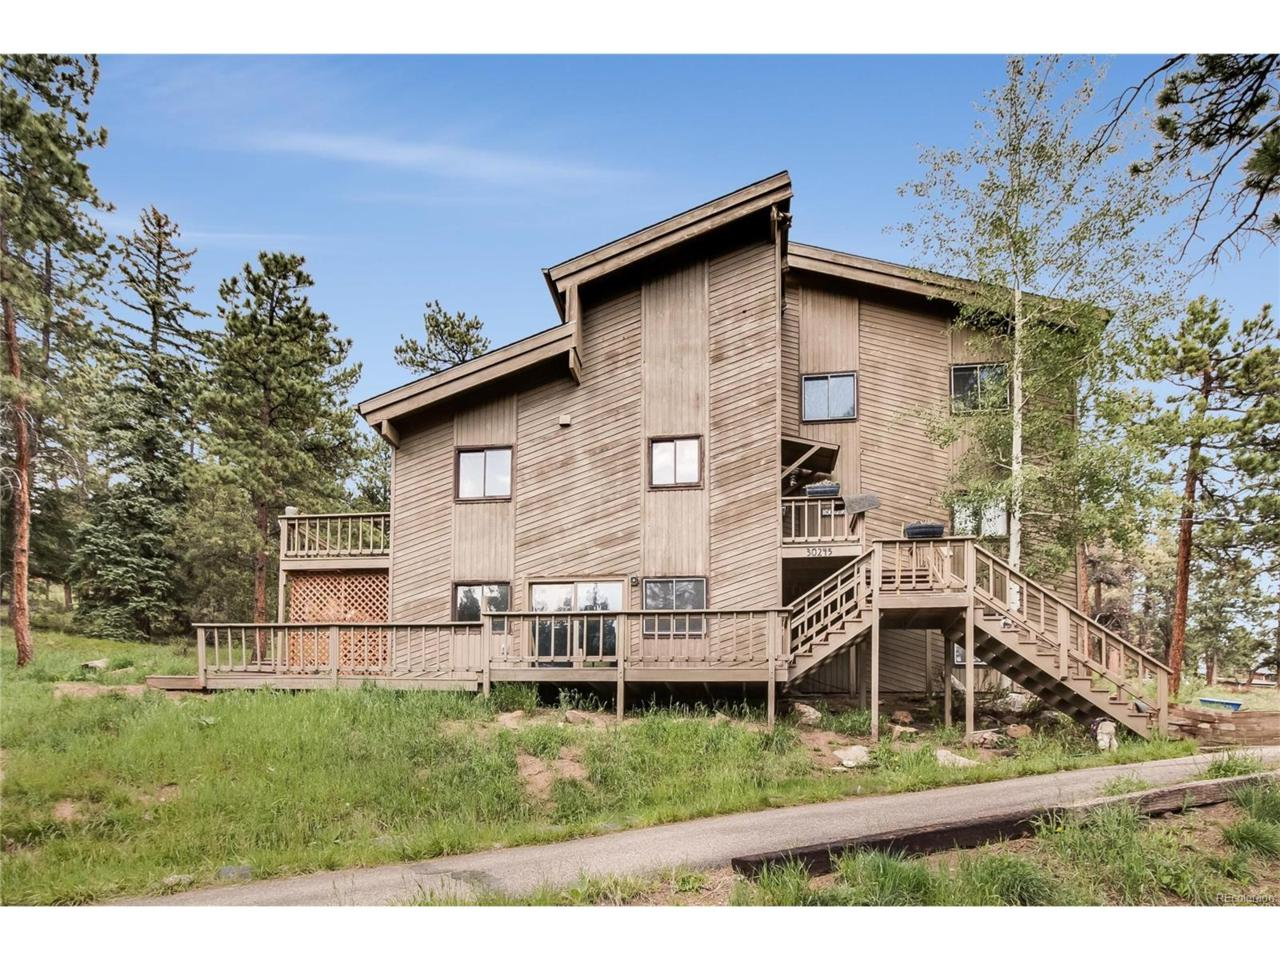 30245 Monroe Drive, Evergreen, CO 80439 (MLS #3725547) :: 8z Real Estate